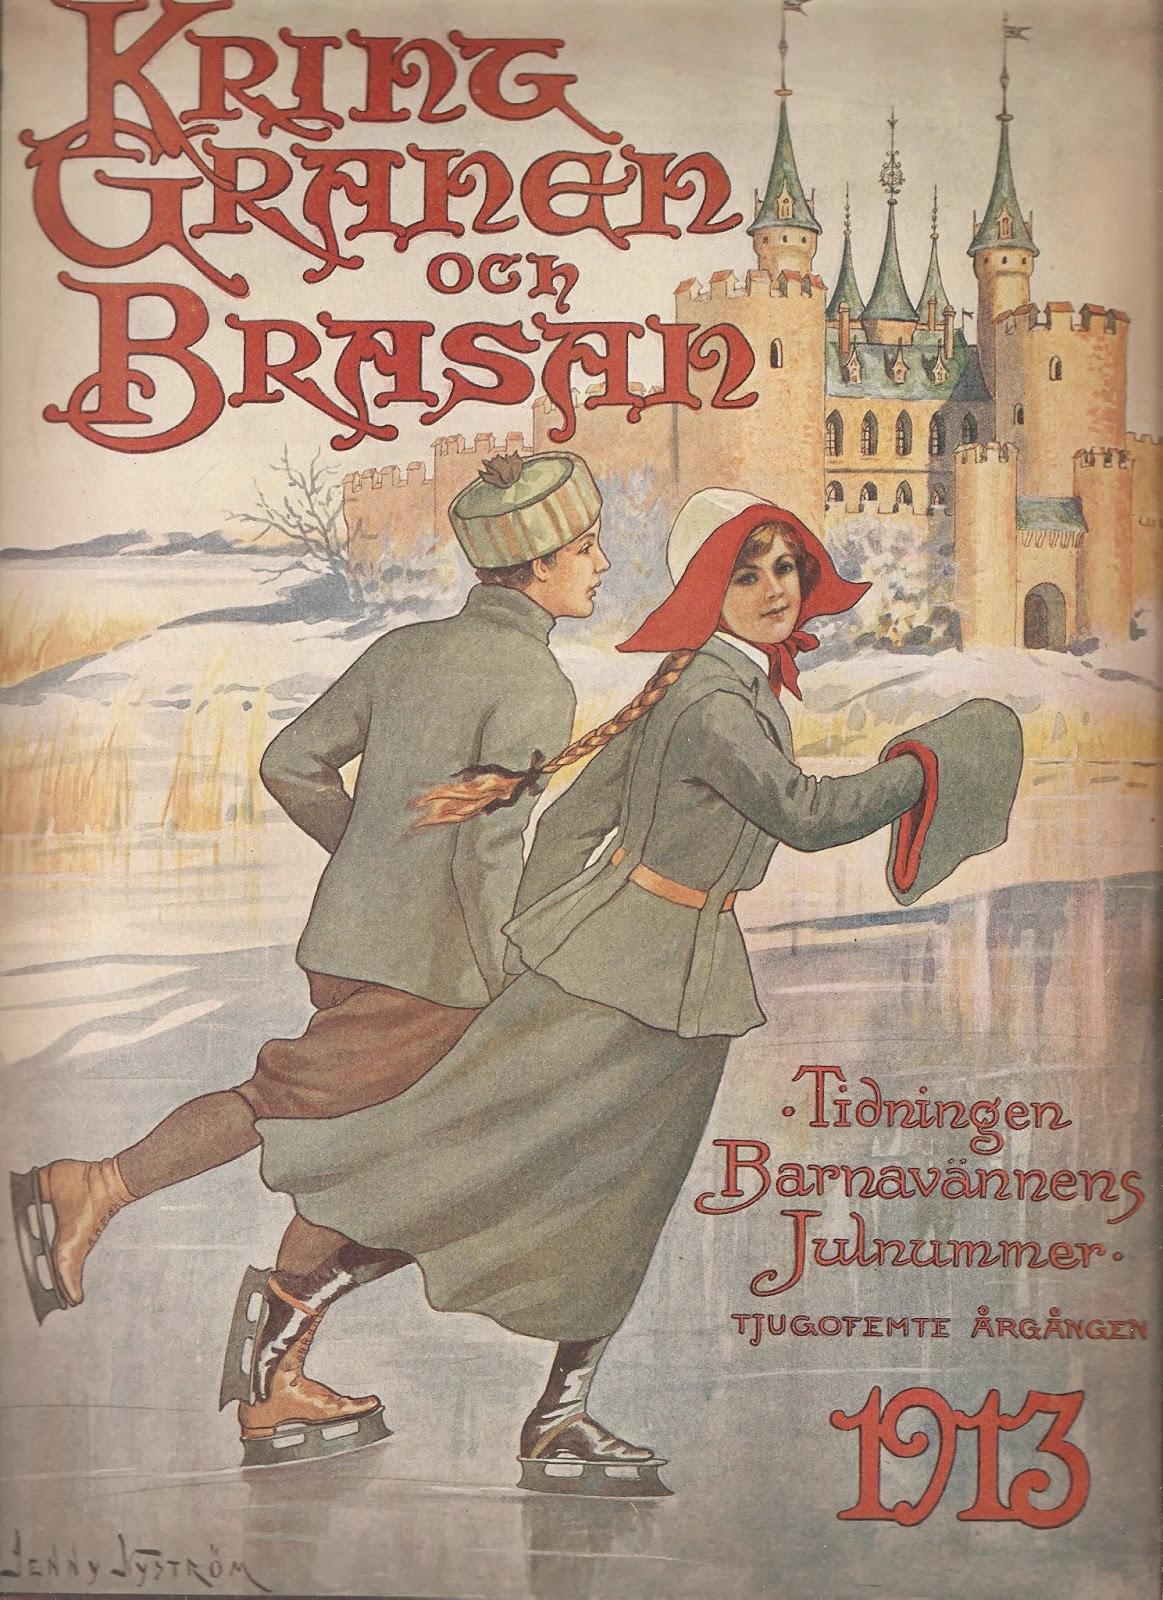 Kring granen och brasan - Jenny Nyström - 1913